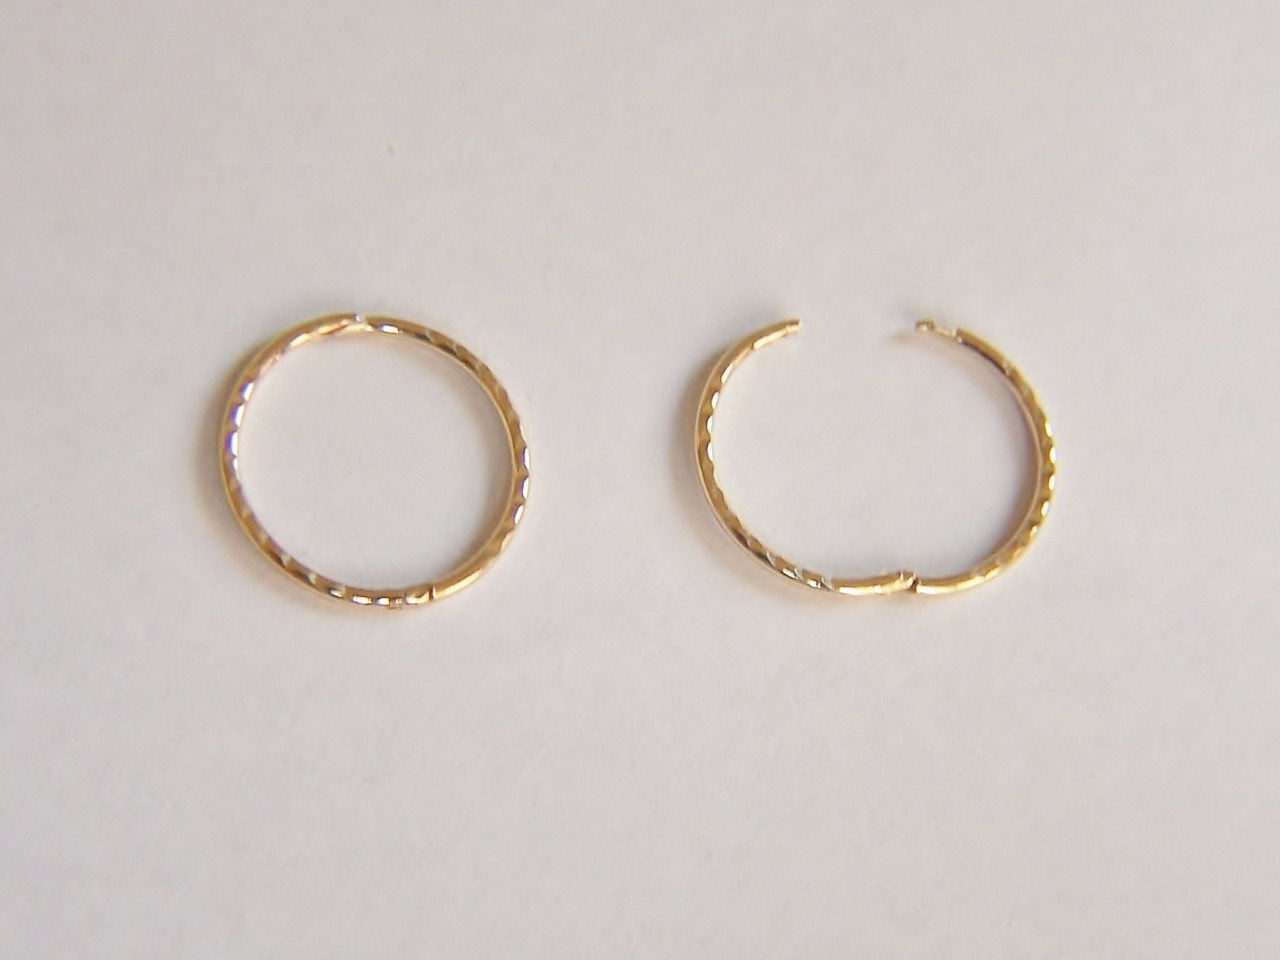 9ct gold 13mm small cut hinged hoop sleeper